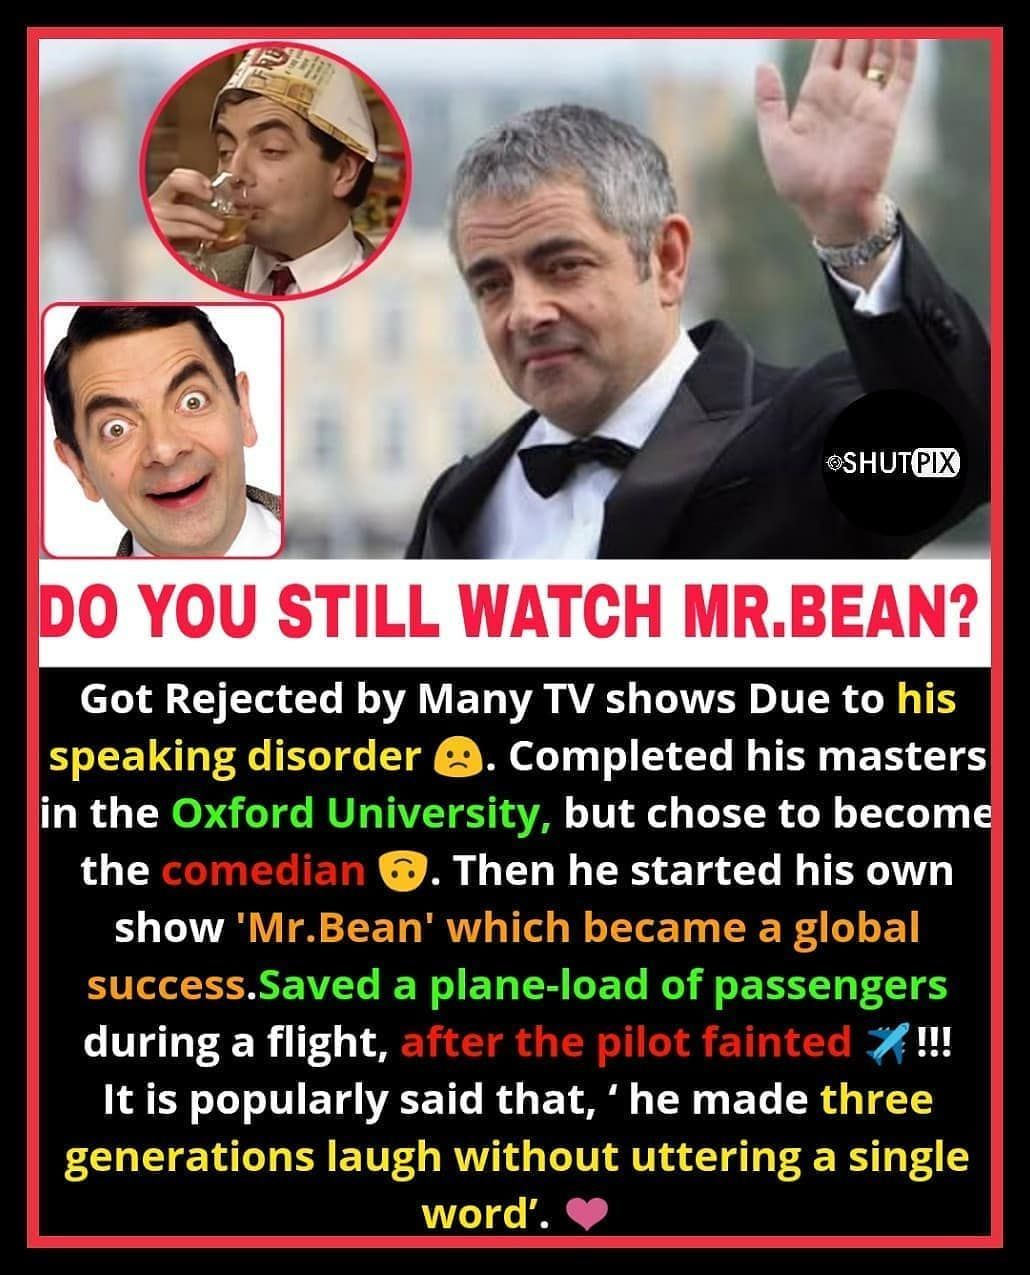 #interesting #knowledge #favourite #oladunni #regrann #shutpix #cartoon #follow #comedy #facts #spac...